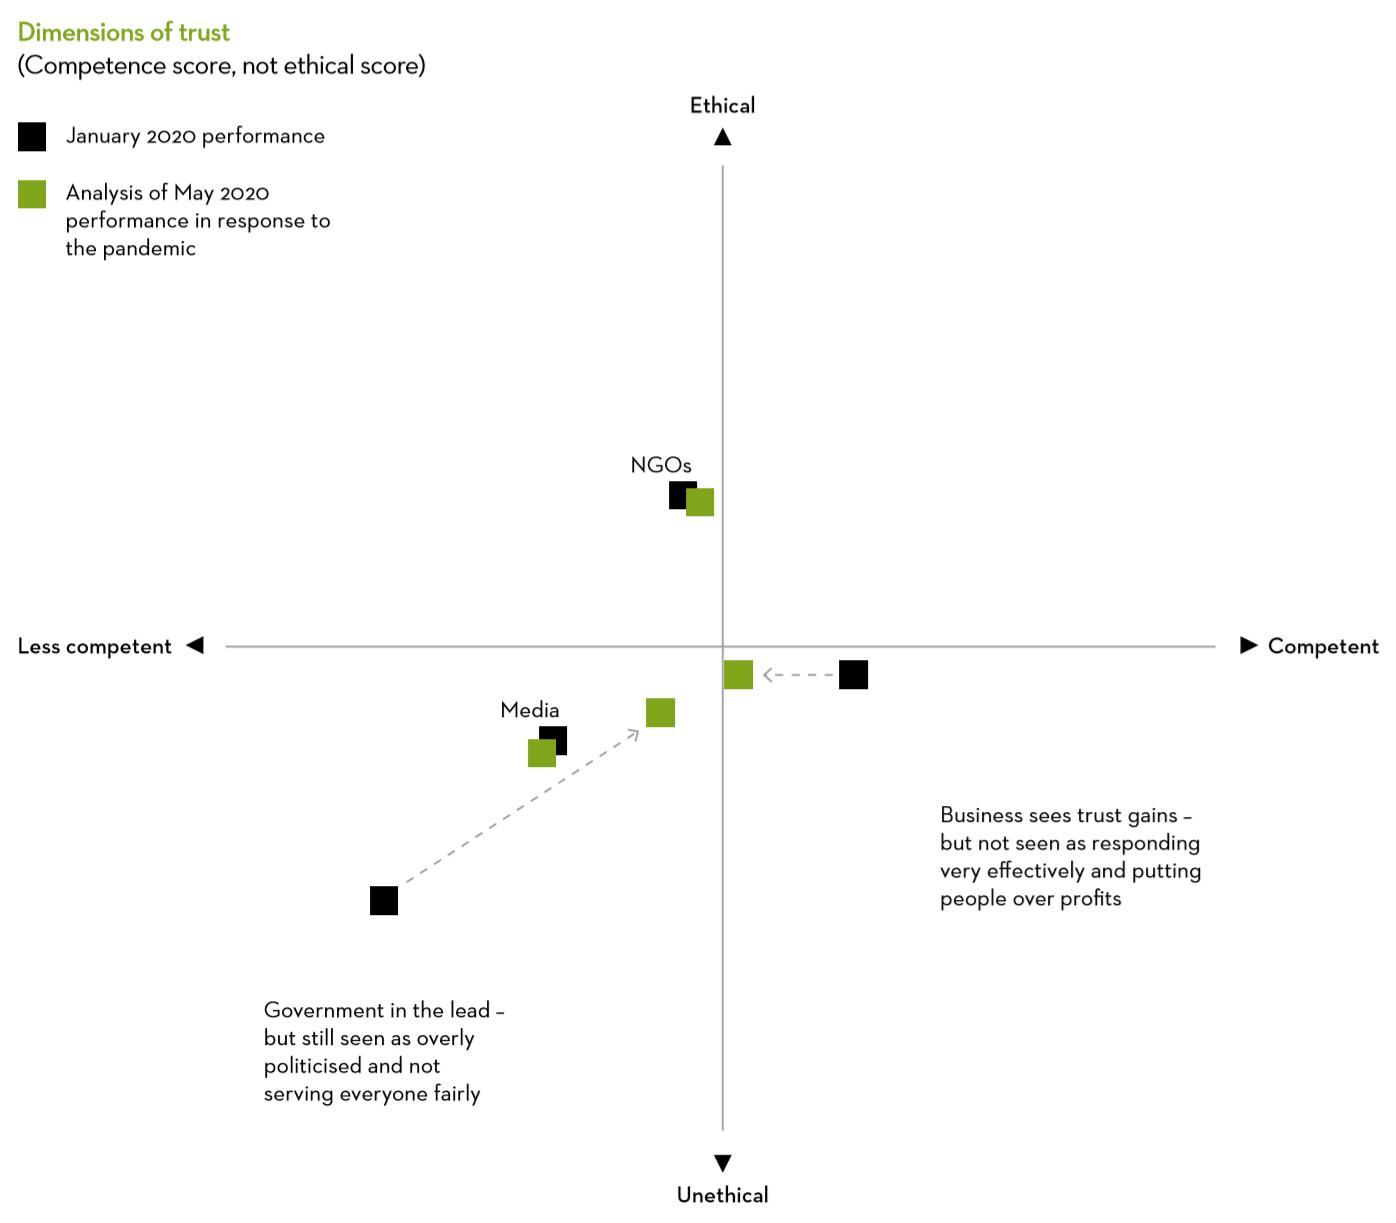 LTII - Sustainability post-COVID